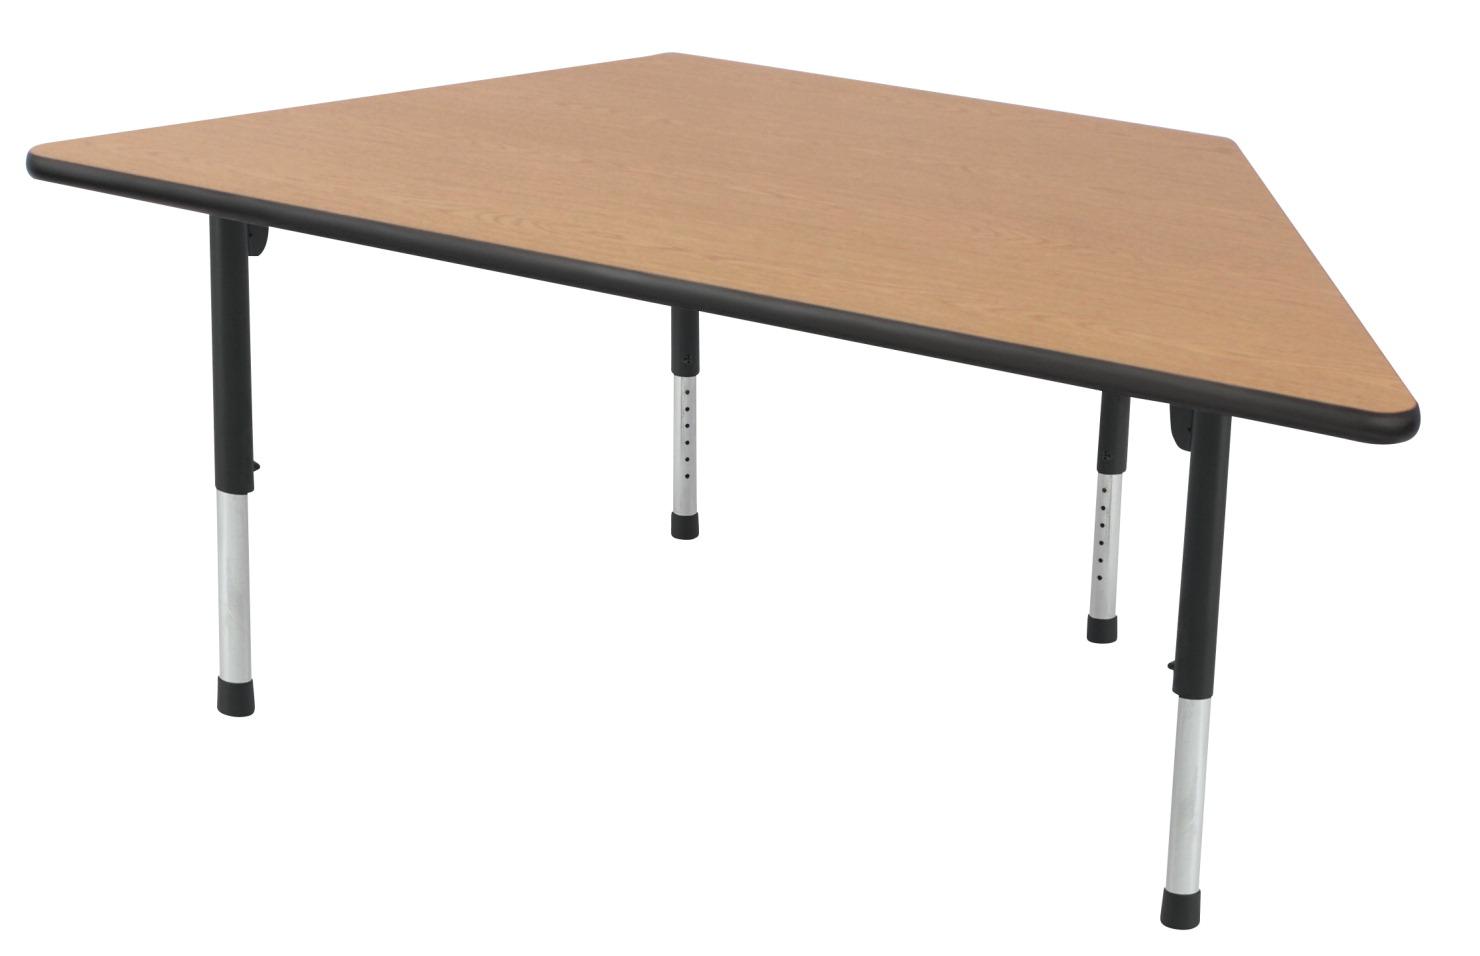 Classroom Select Adjustable Table School Specialty Marketplace